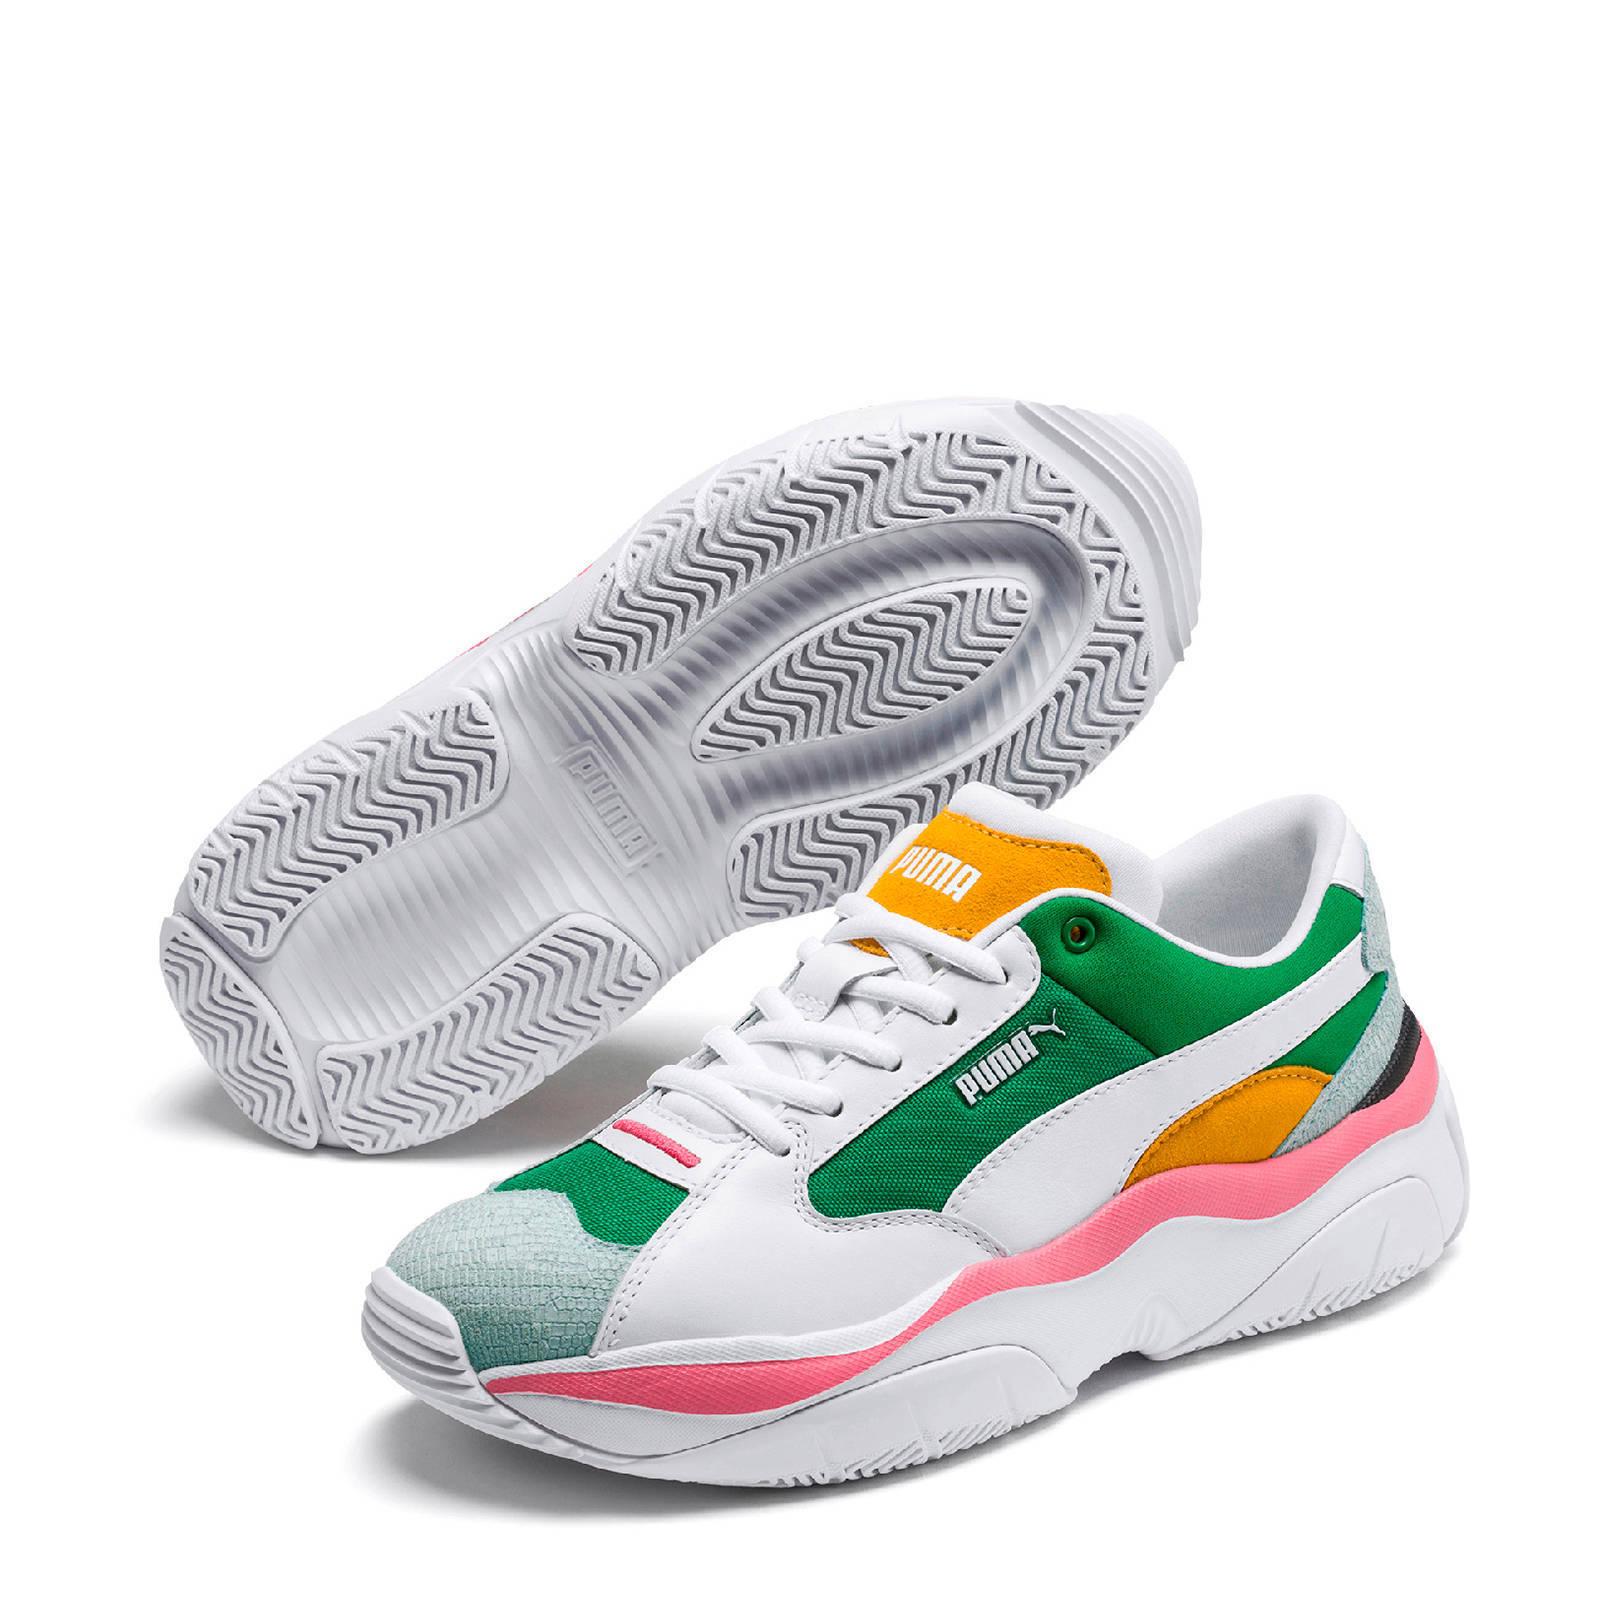 Puma Storm.Y Colour Block sneakers wit/groen/roze/oranje ...